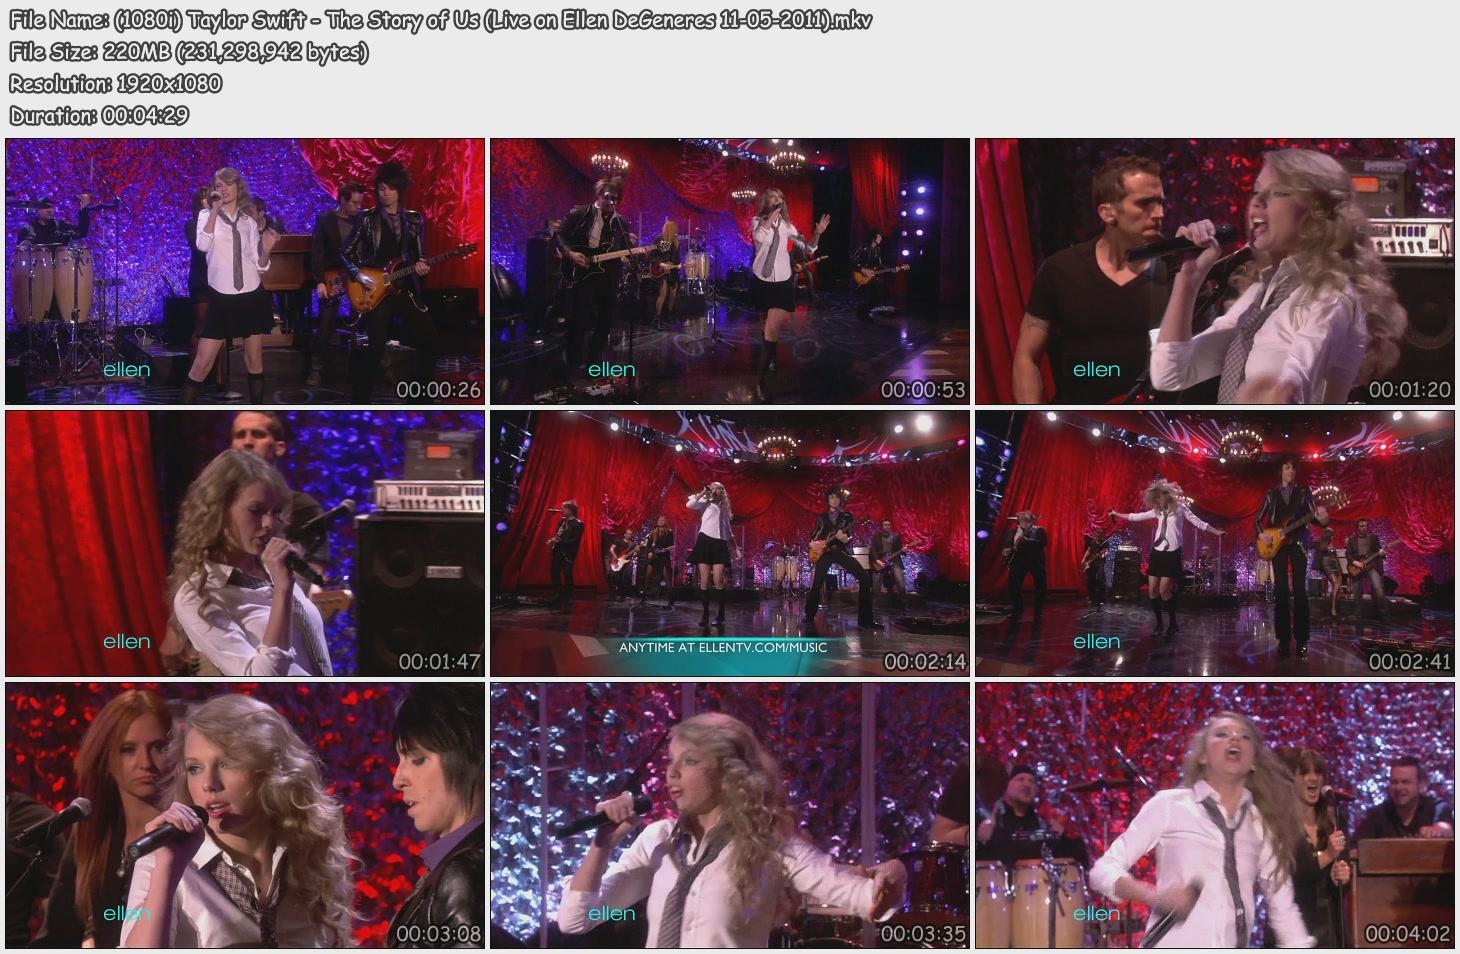 http://1.bp.blogspot.com/-pjZWAhqFBlE/TeEPfxMHGrI/AAAAAAAAAOQ/xVgxi-ZULlg/s1600/%25281080i%2529+Taylor+Swift+-+The+Story+of+Us+%2528Live+on+Ellen+DeGeneres+11-05-2011%2529.jpg